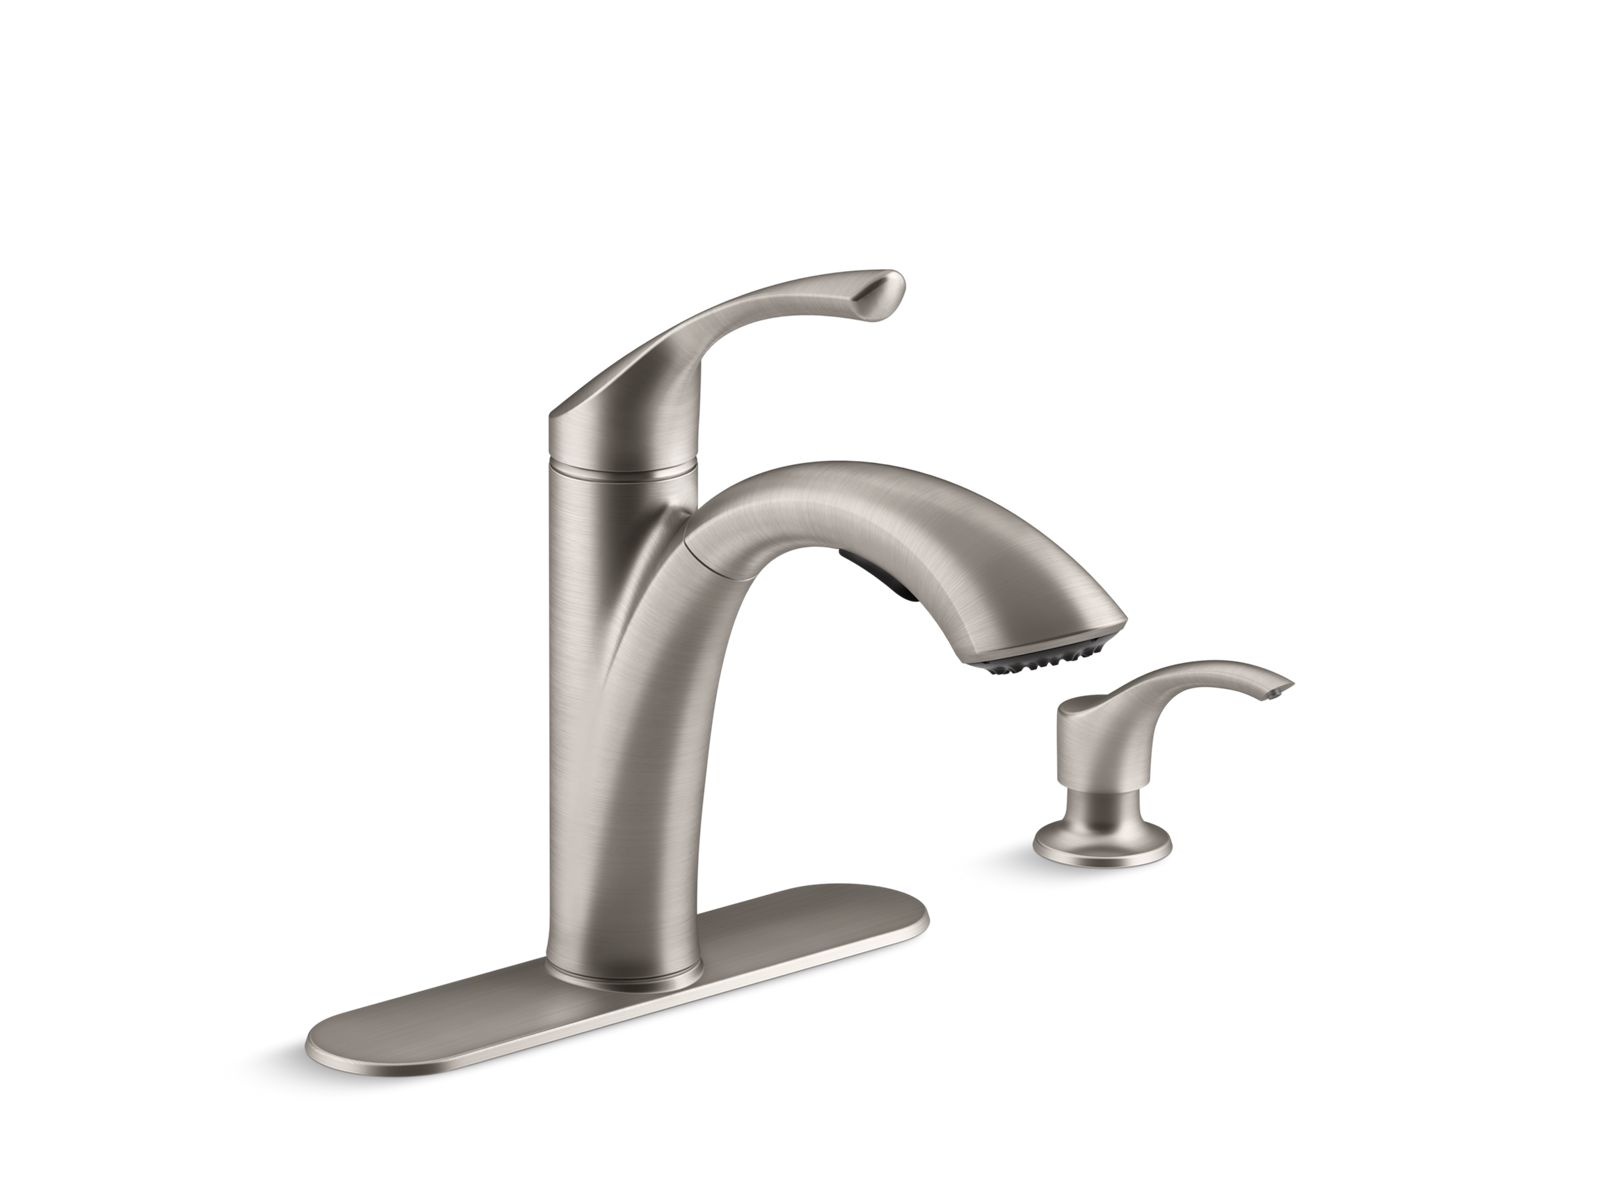 k r72510 sd mistos pull out kitchen faucet with dispenser kohler